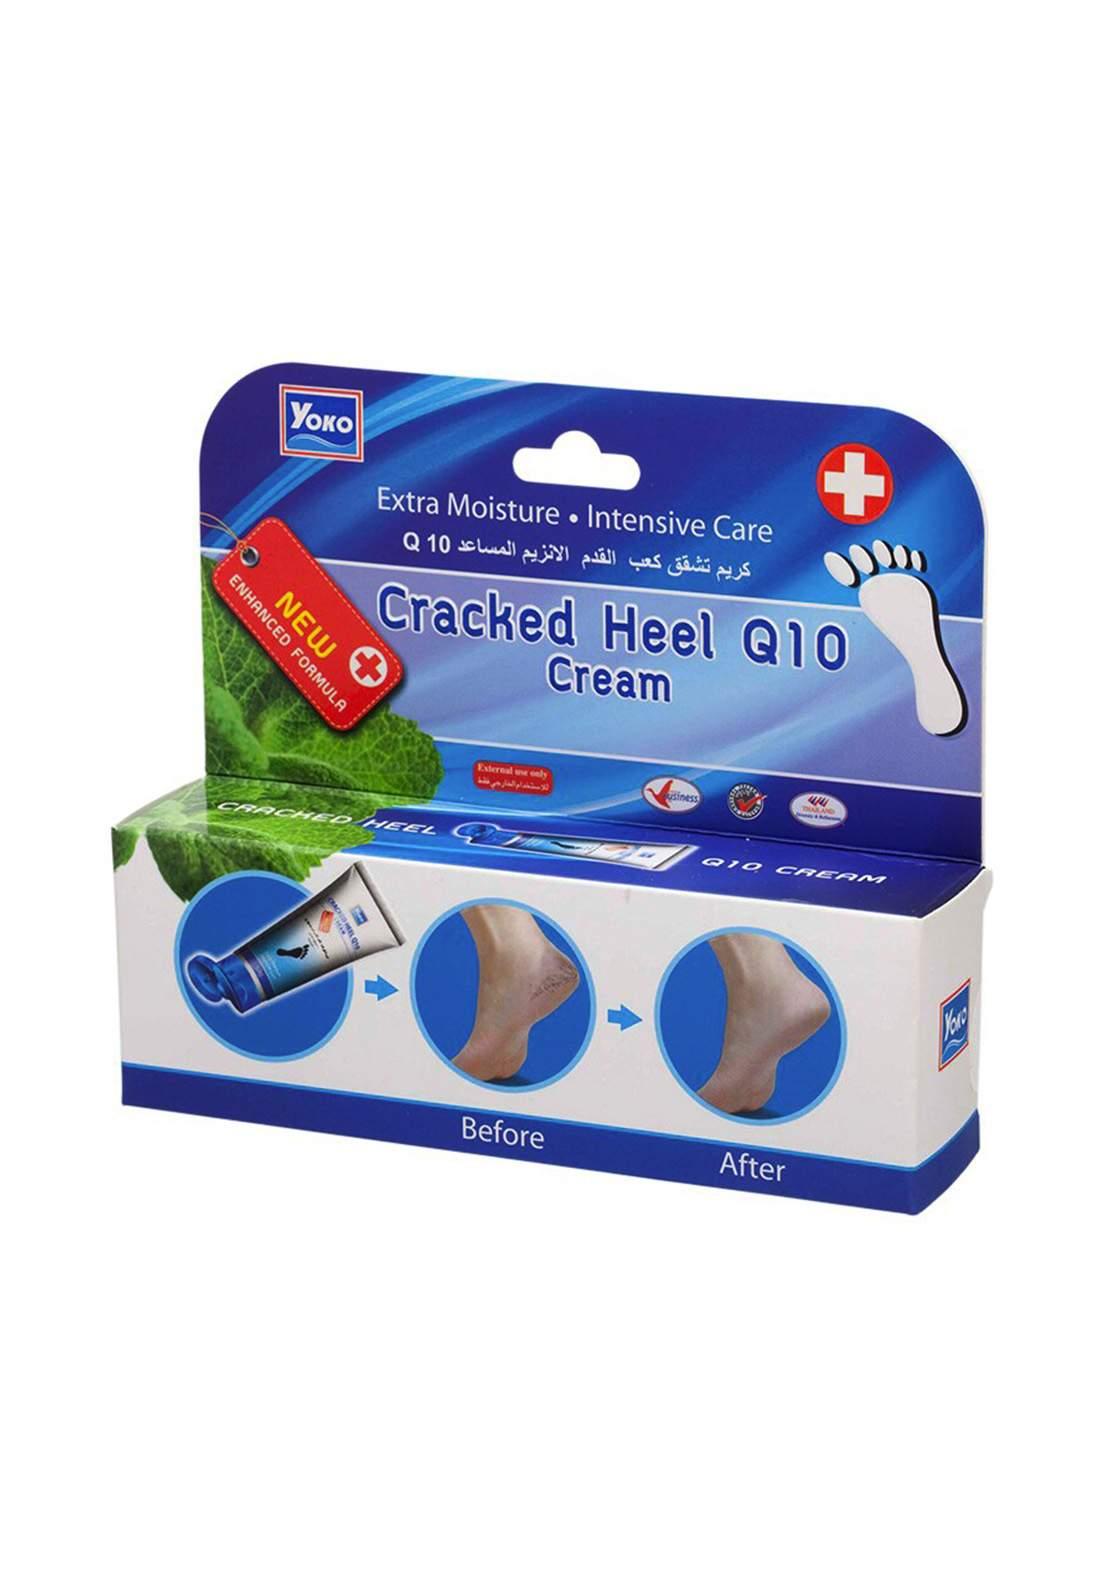 Yoko Cracked Heel Q10 Cream 50g  كريم تشققات القدم